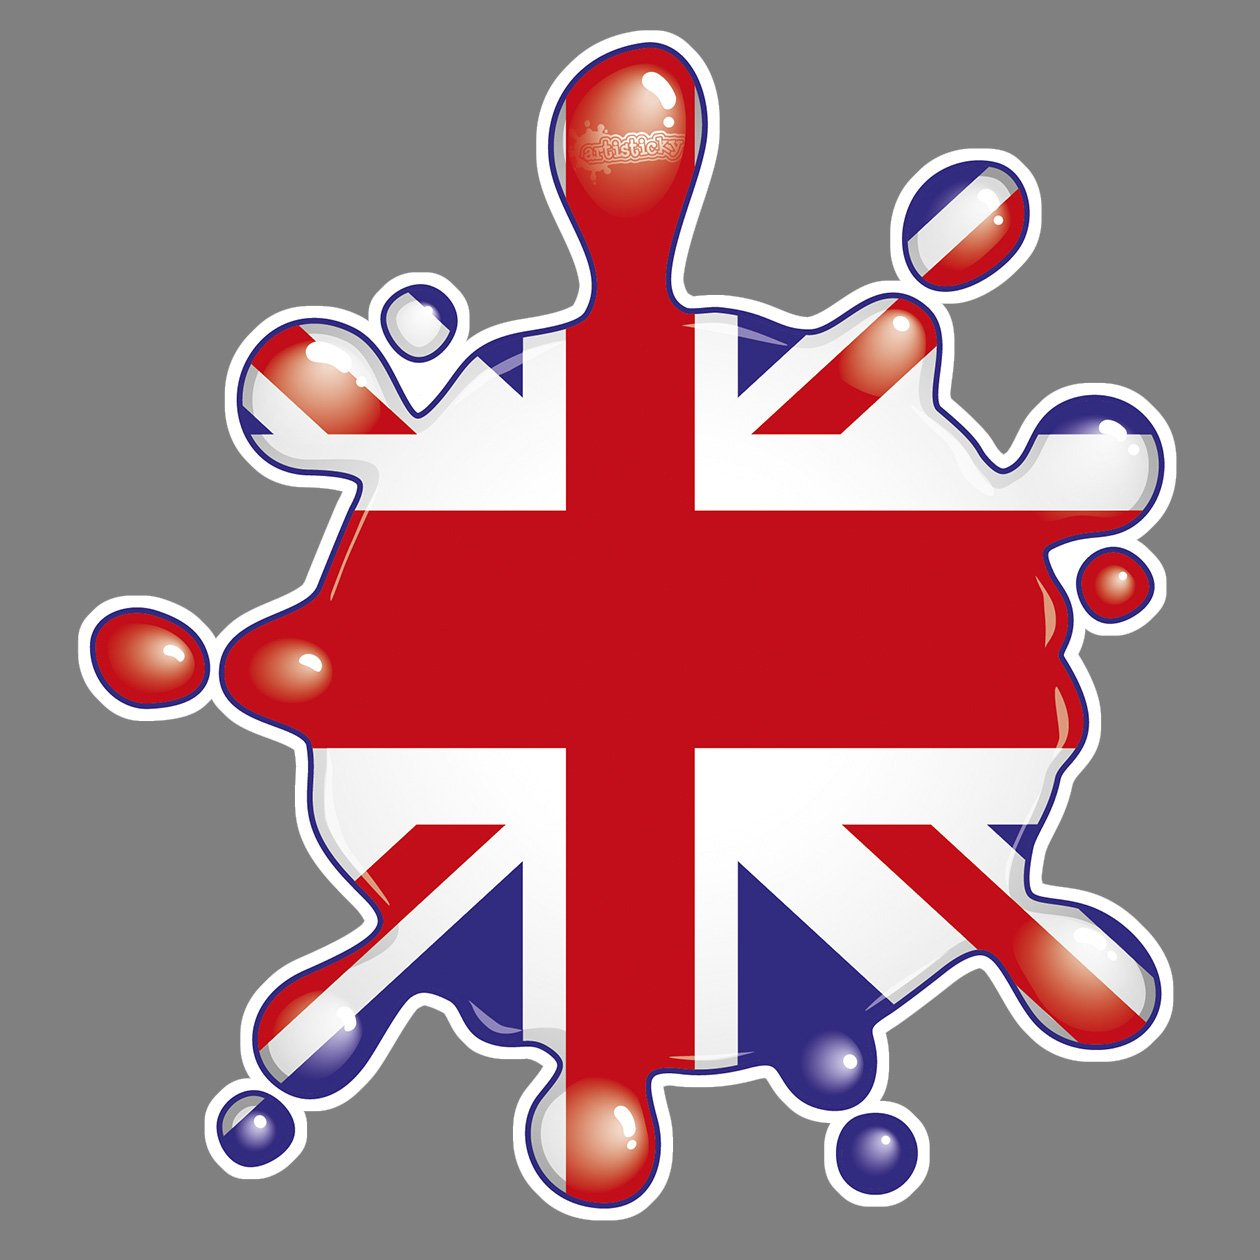 Parking Permit Holder Skin UK GB SPLAT RED WHITE BLUE FREE POSTAGE